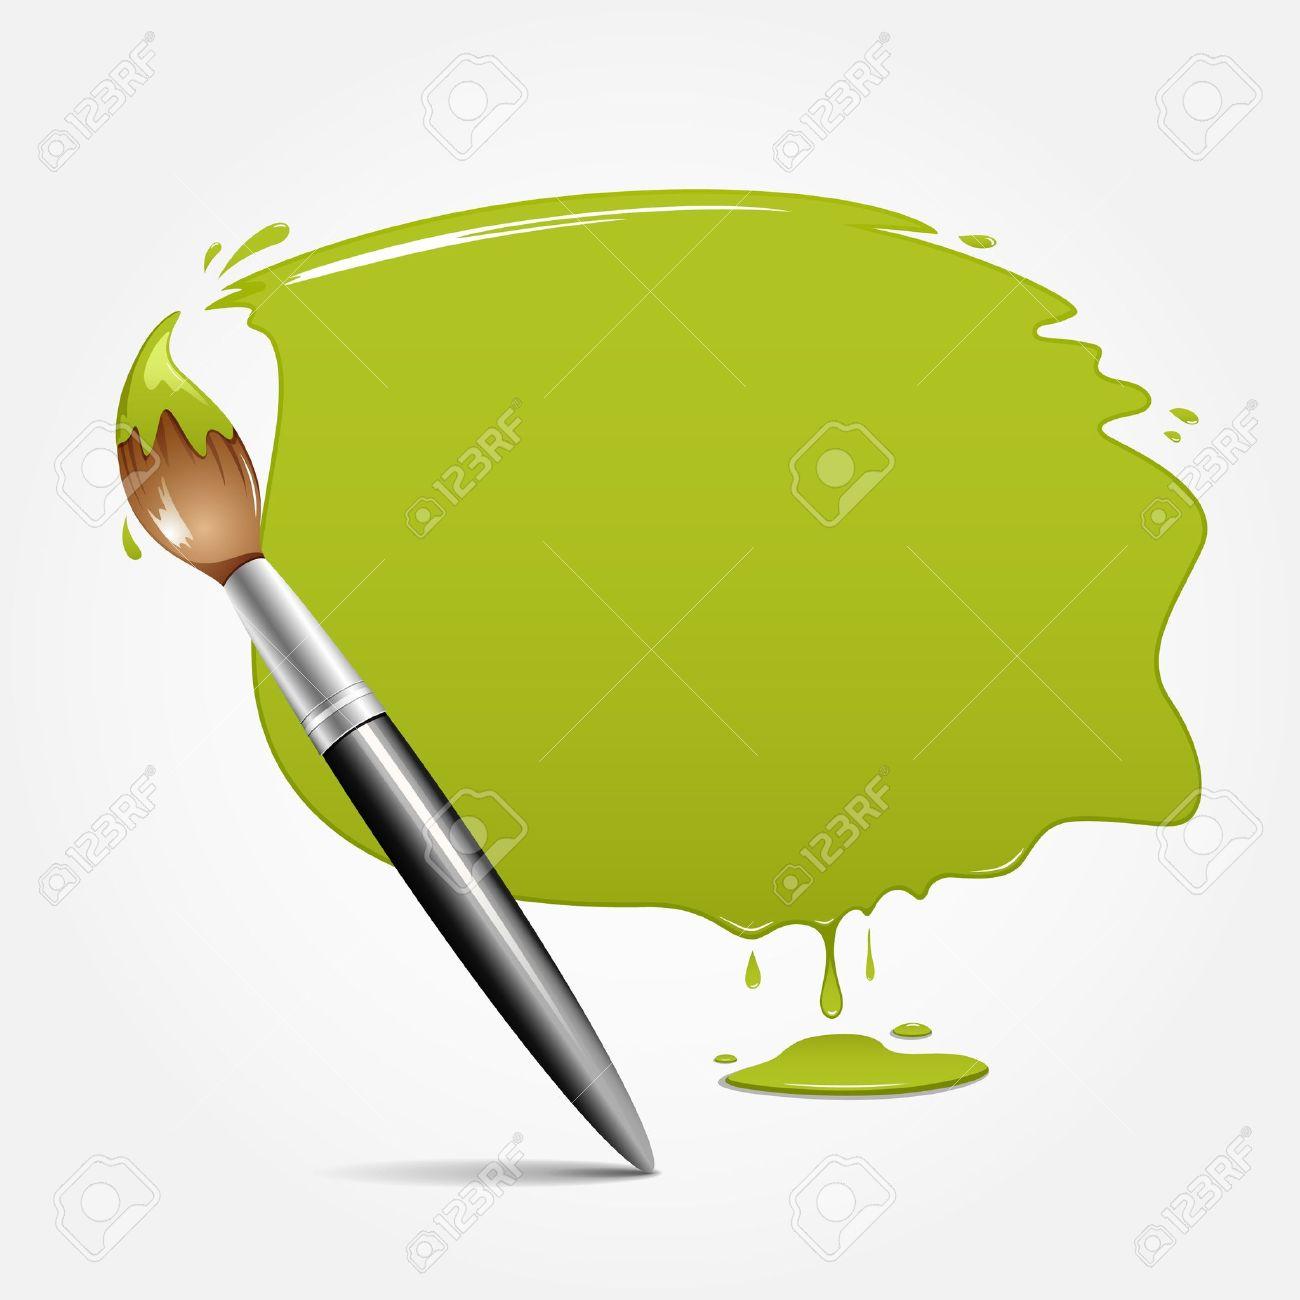 Paint brush  green background, vector illustration Stock Vector - 14615688